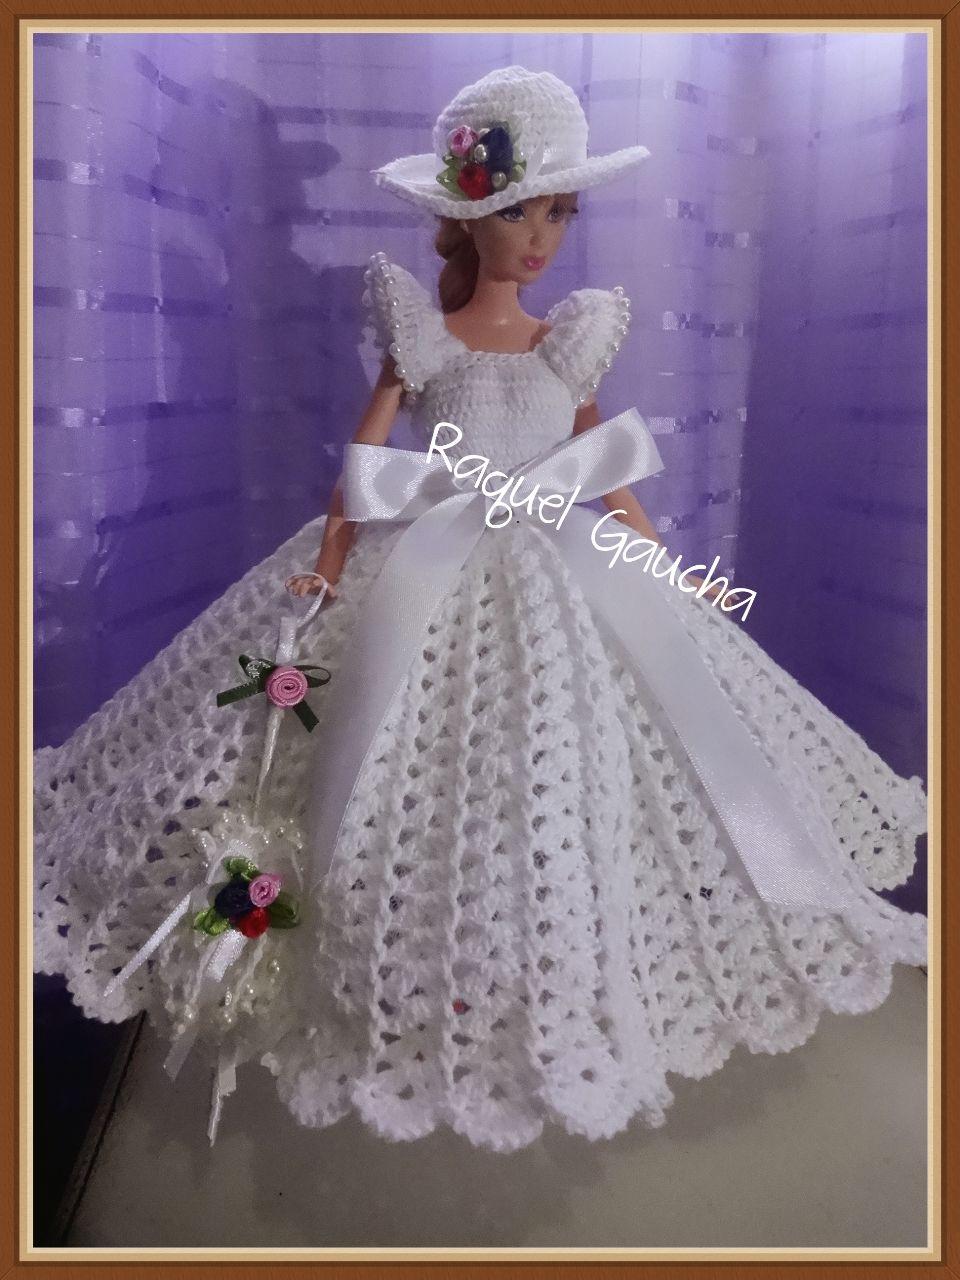 Cléa5 #Doll #Crochet #Vestido #Dress #Muñeca #Barbie #RaquelGaucha ...